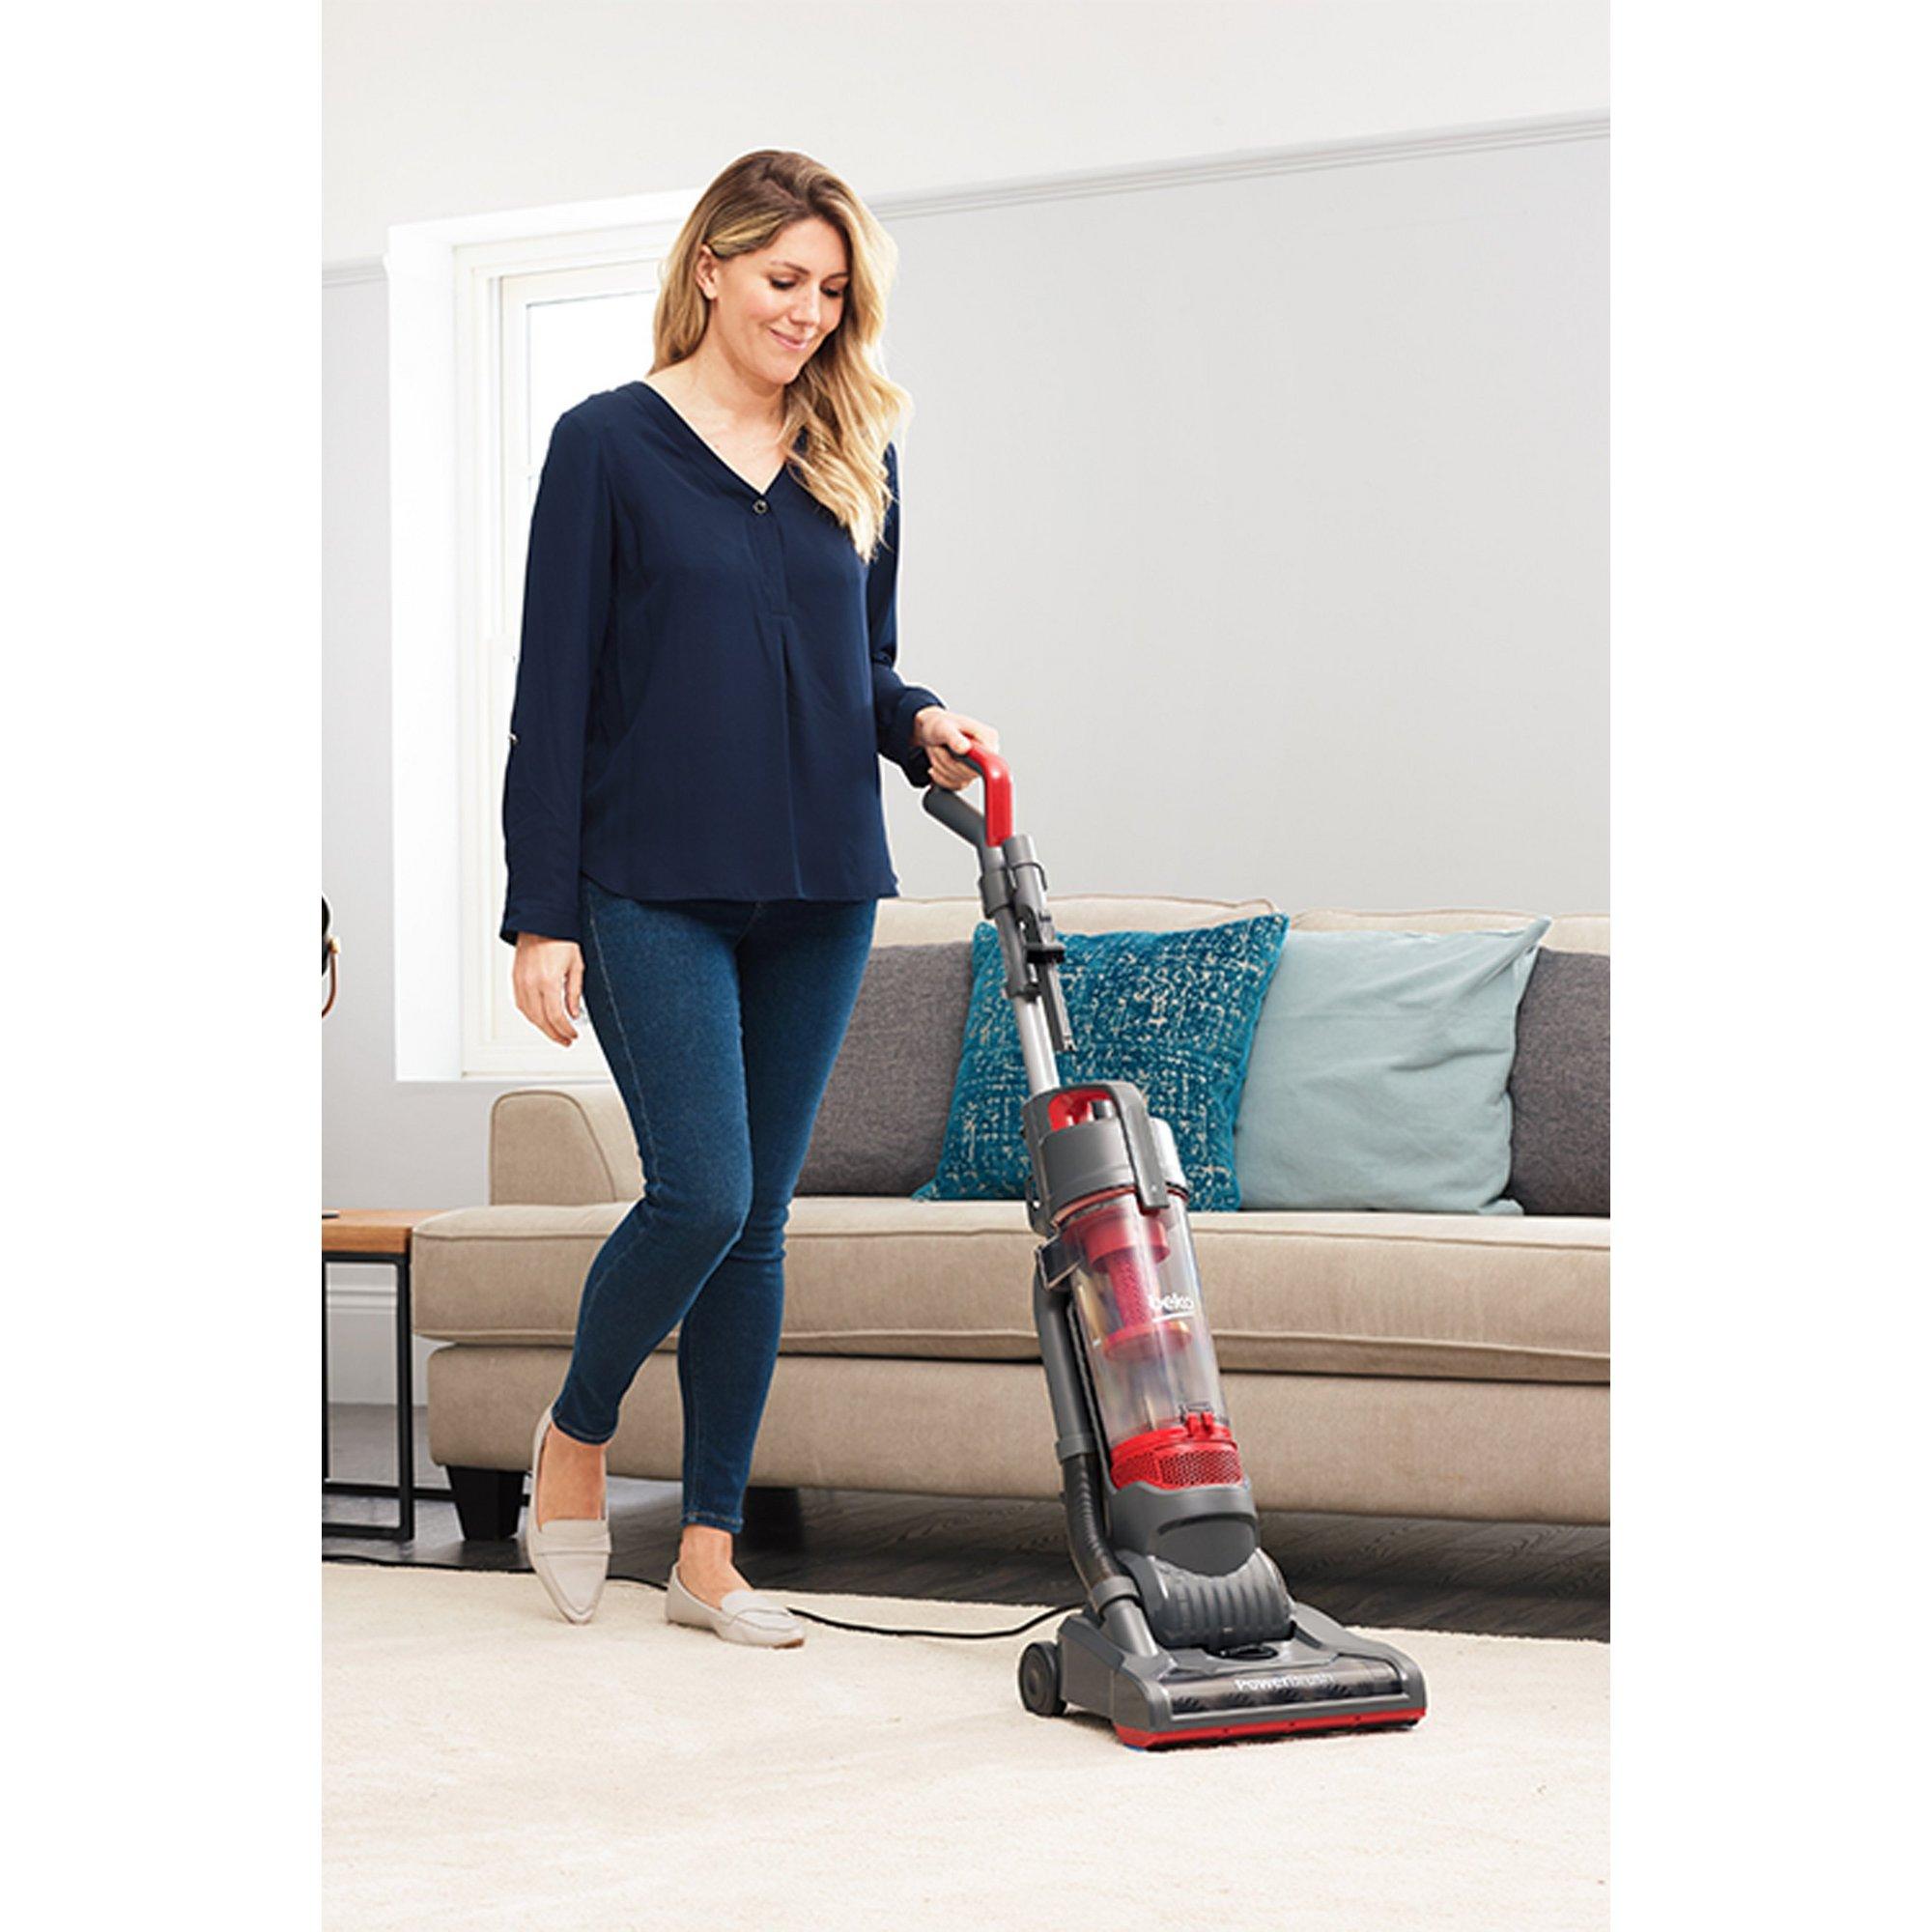 Image of Beko 2.8L Upright Vacuum Cleaner